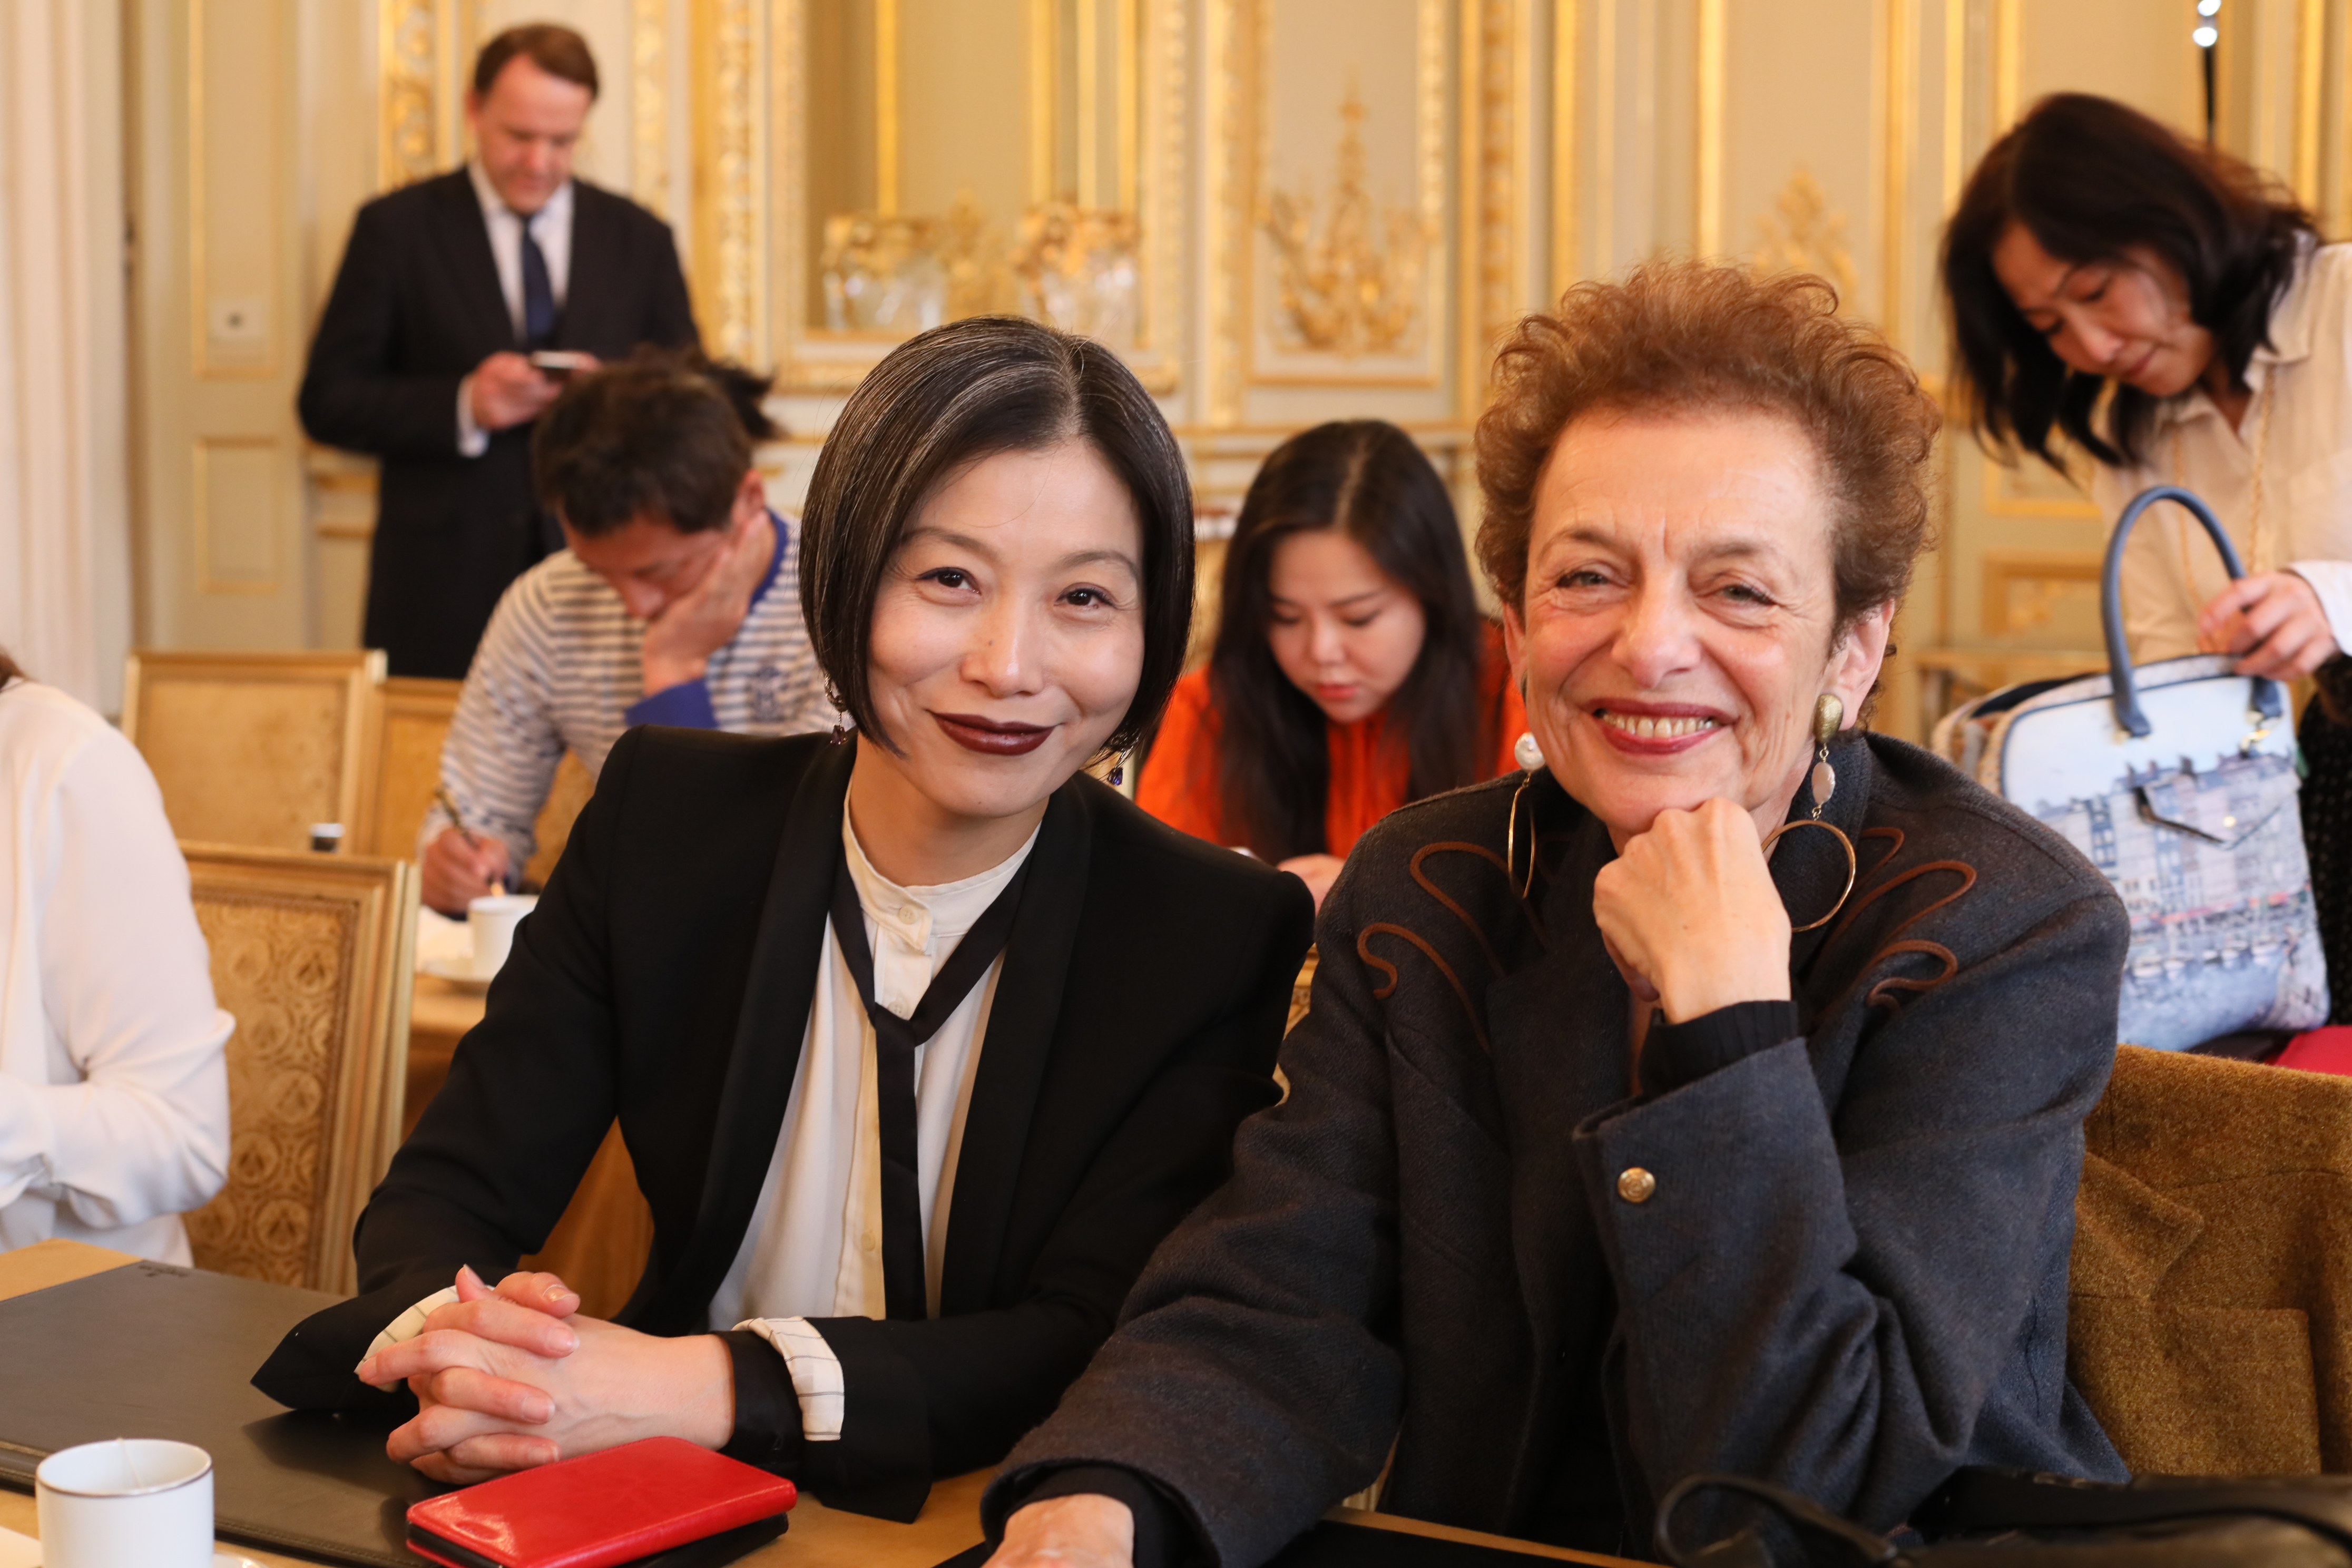 CNCA赵倩:在文化的黄金年代,向世界展示中国的文化自信